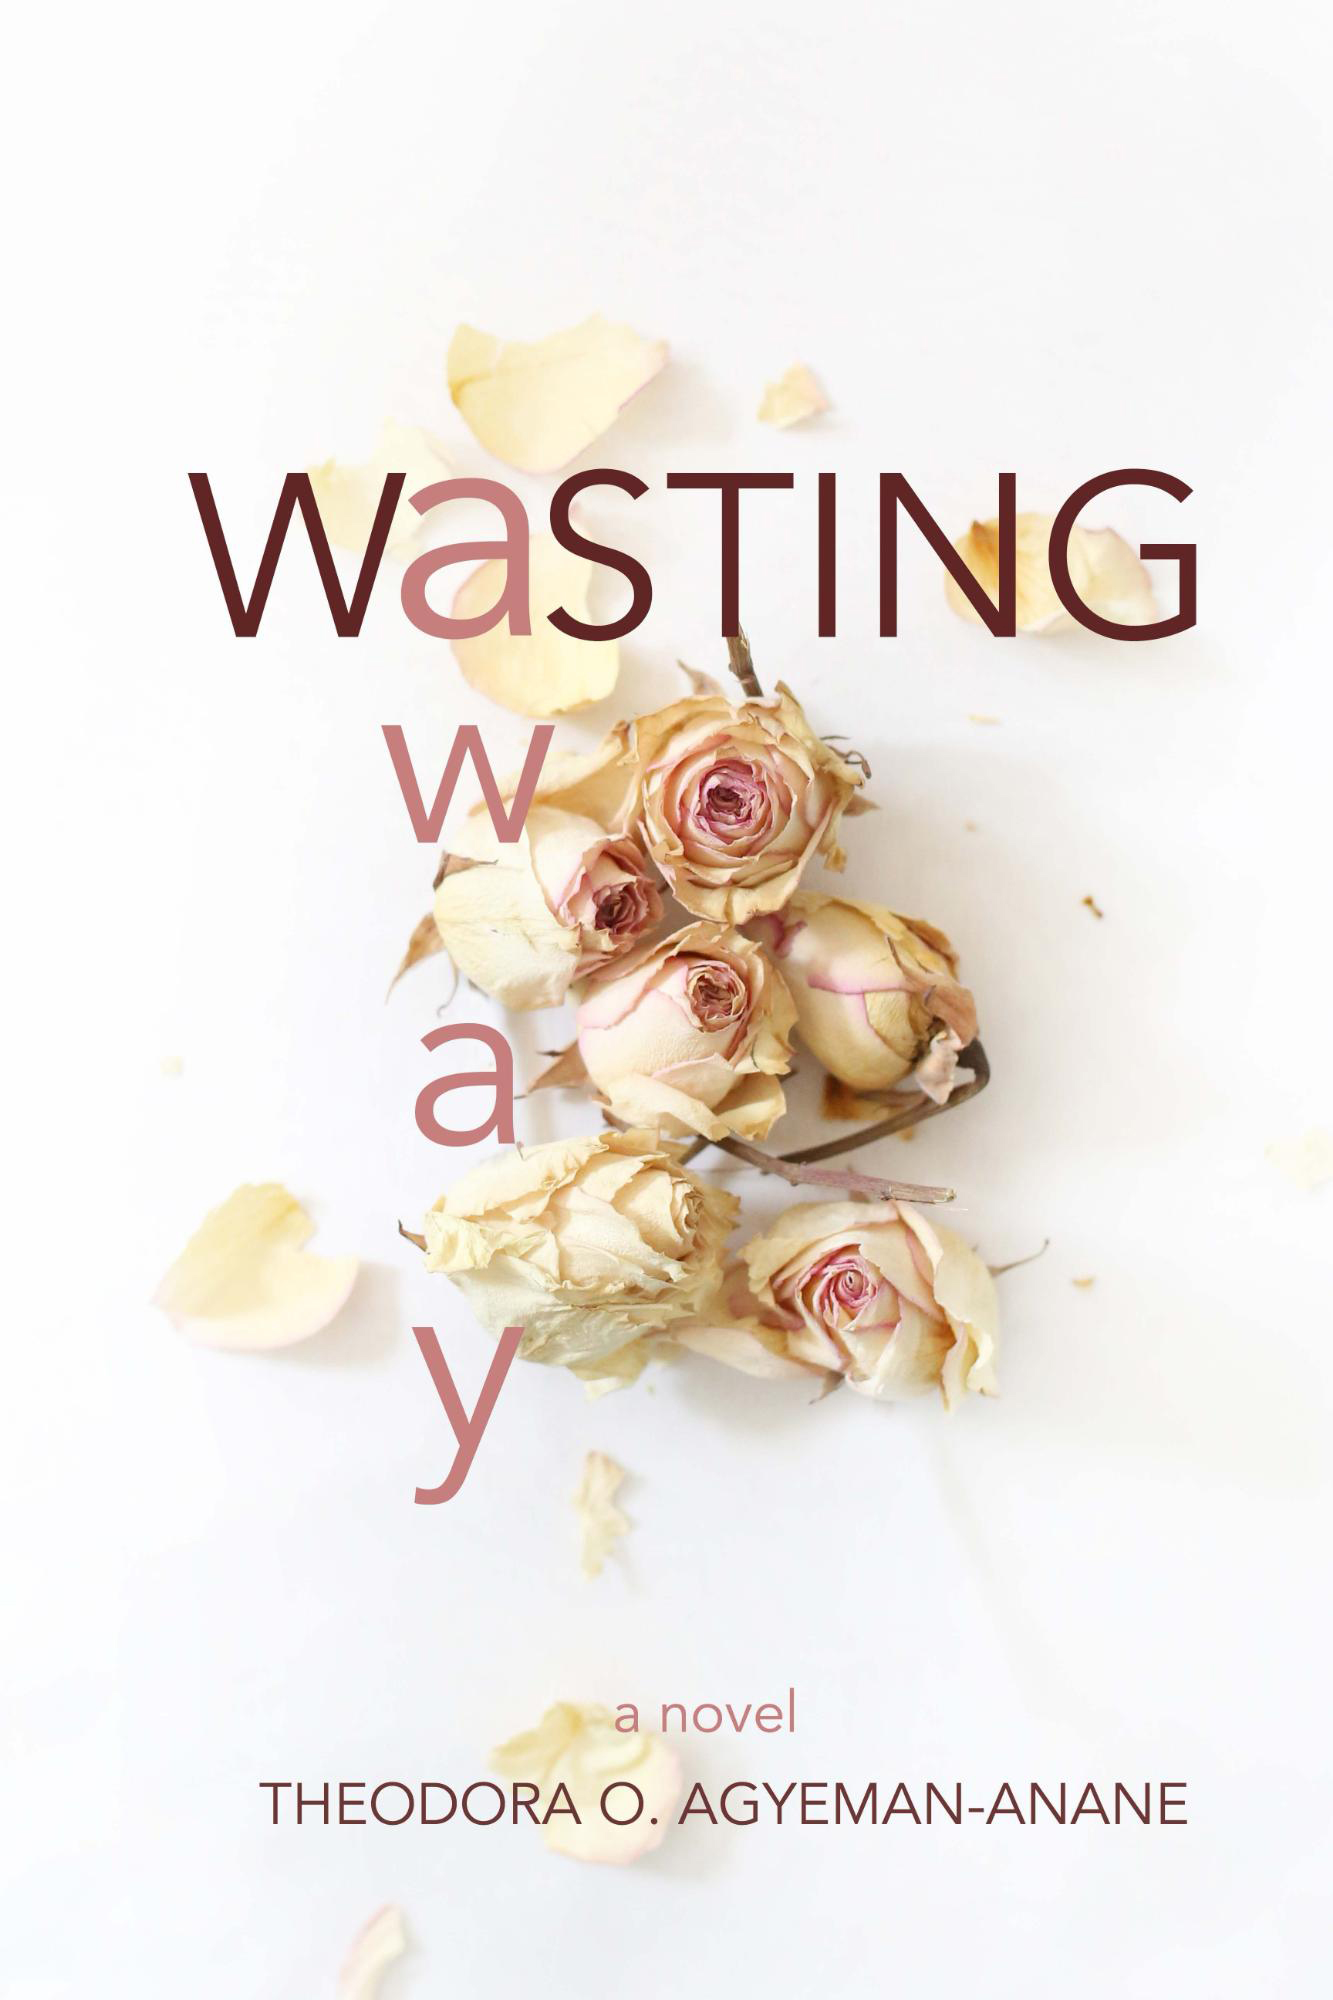 http://www.amazon.com/Wasting-Away-Theodora-Ofosuhima-Agyeman-Anane/dp/1516866428/ref=sr_1_1?s=books&ie=UTF8&qid=1448255469&sr=1-1&keywords=wasting+away